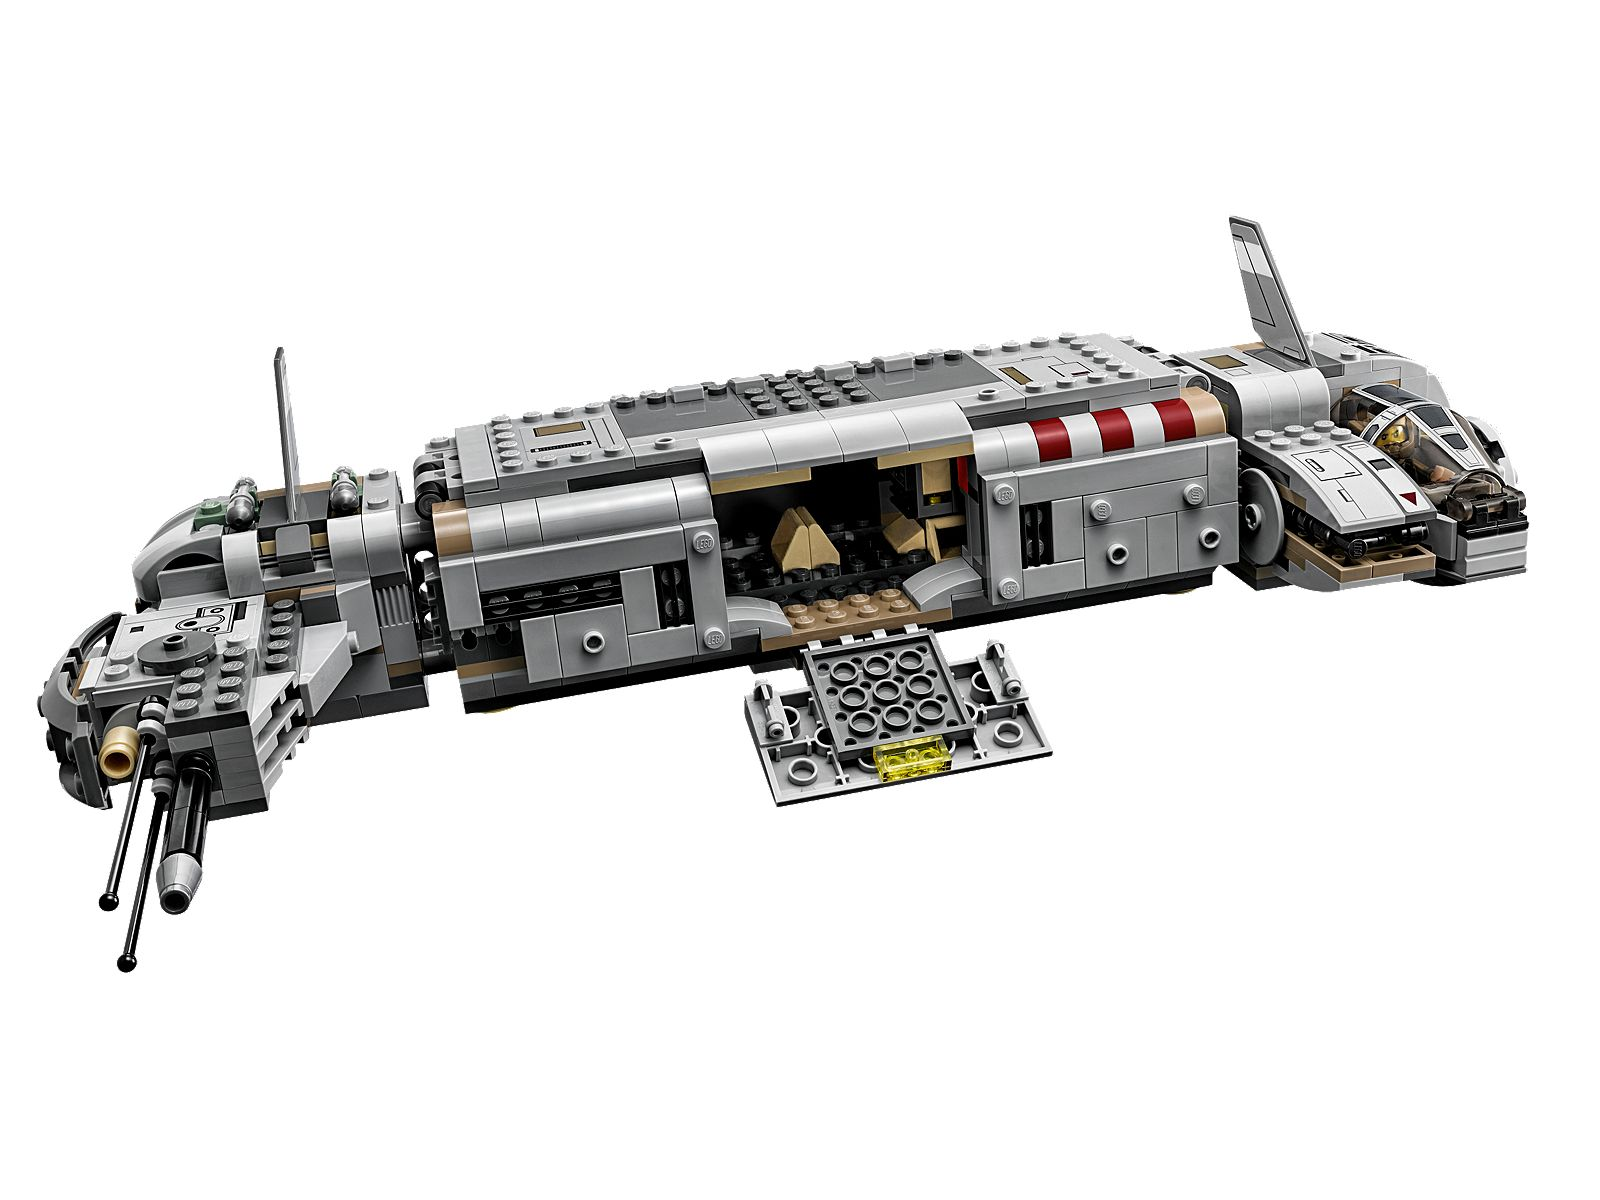 Lego star wars tfa and others 75139 75126 75132 75140 - Lego star warse ...